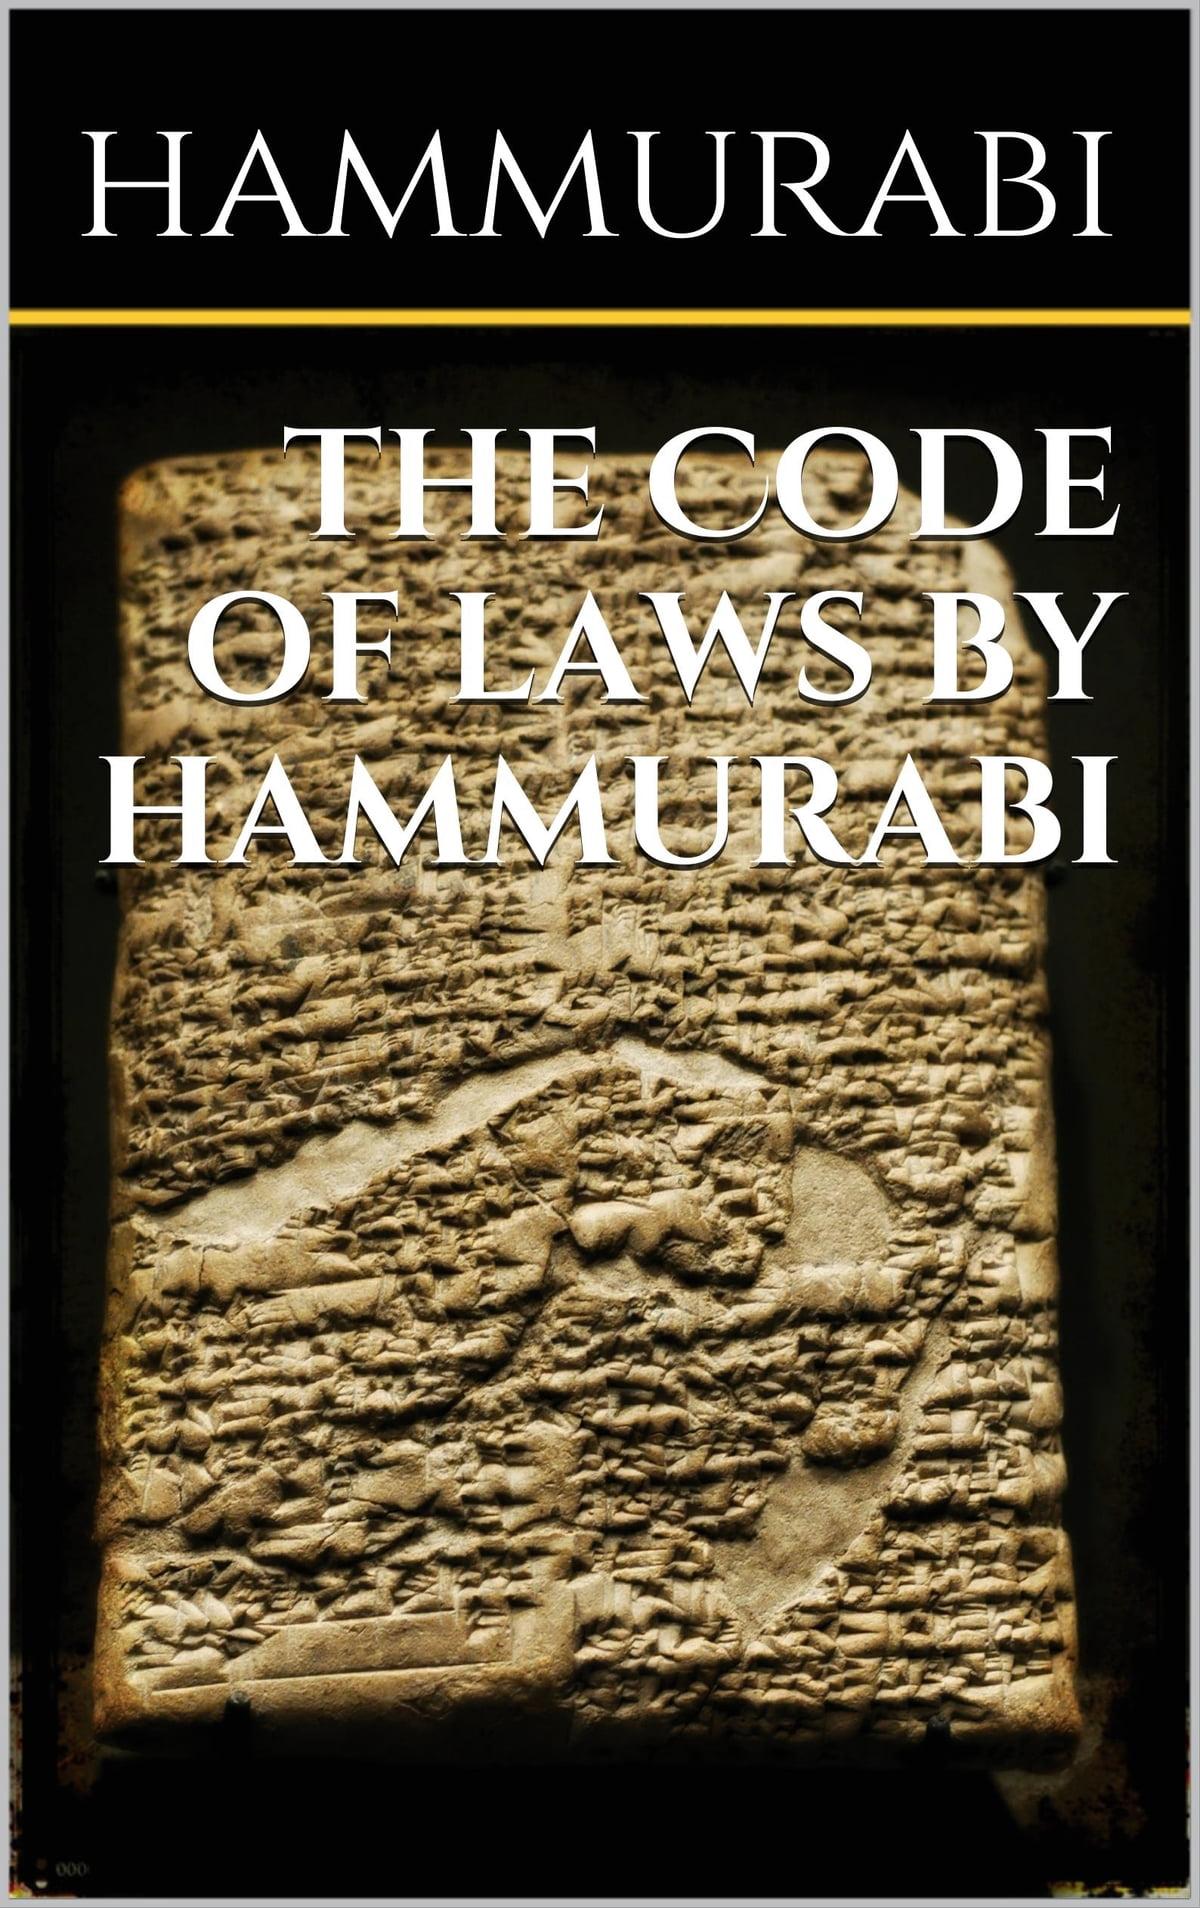 The Code Of Laws By Hammurabi Ebook By Hammurabi Hammurabi